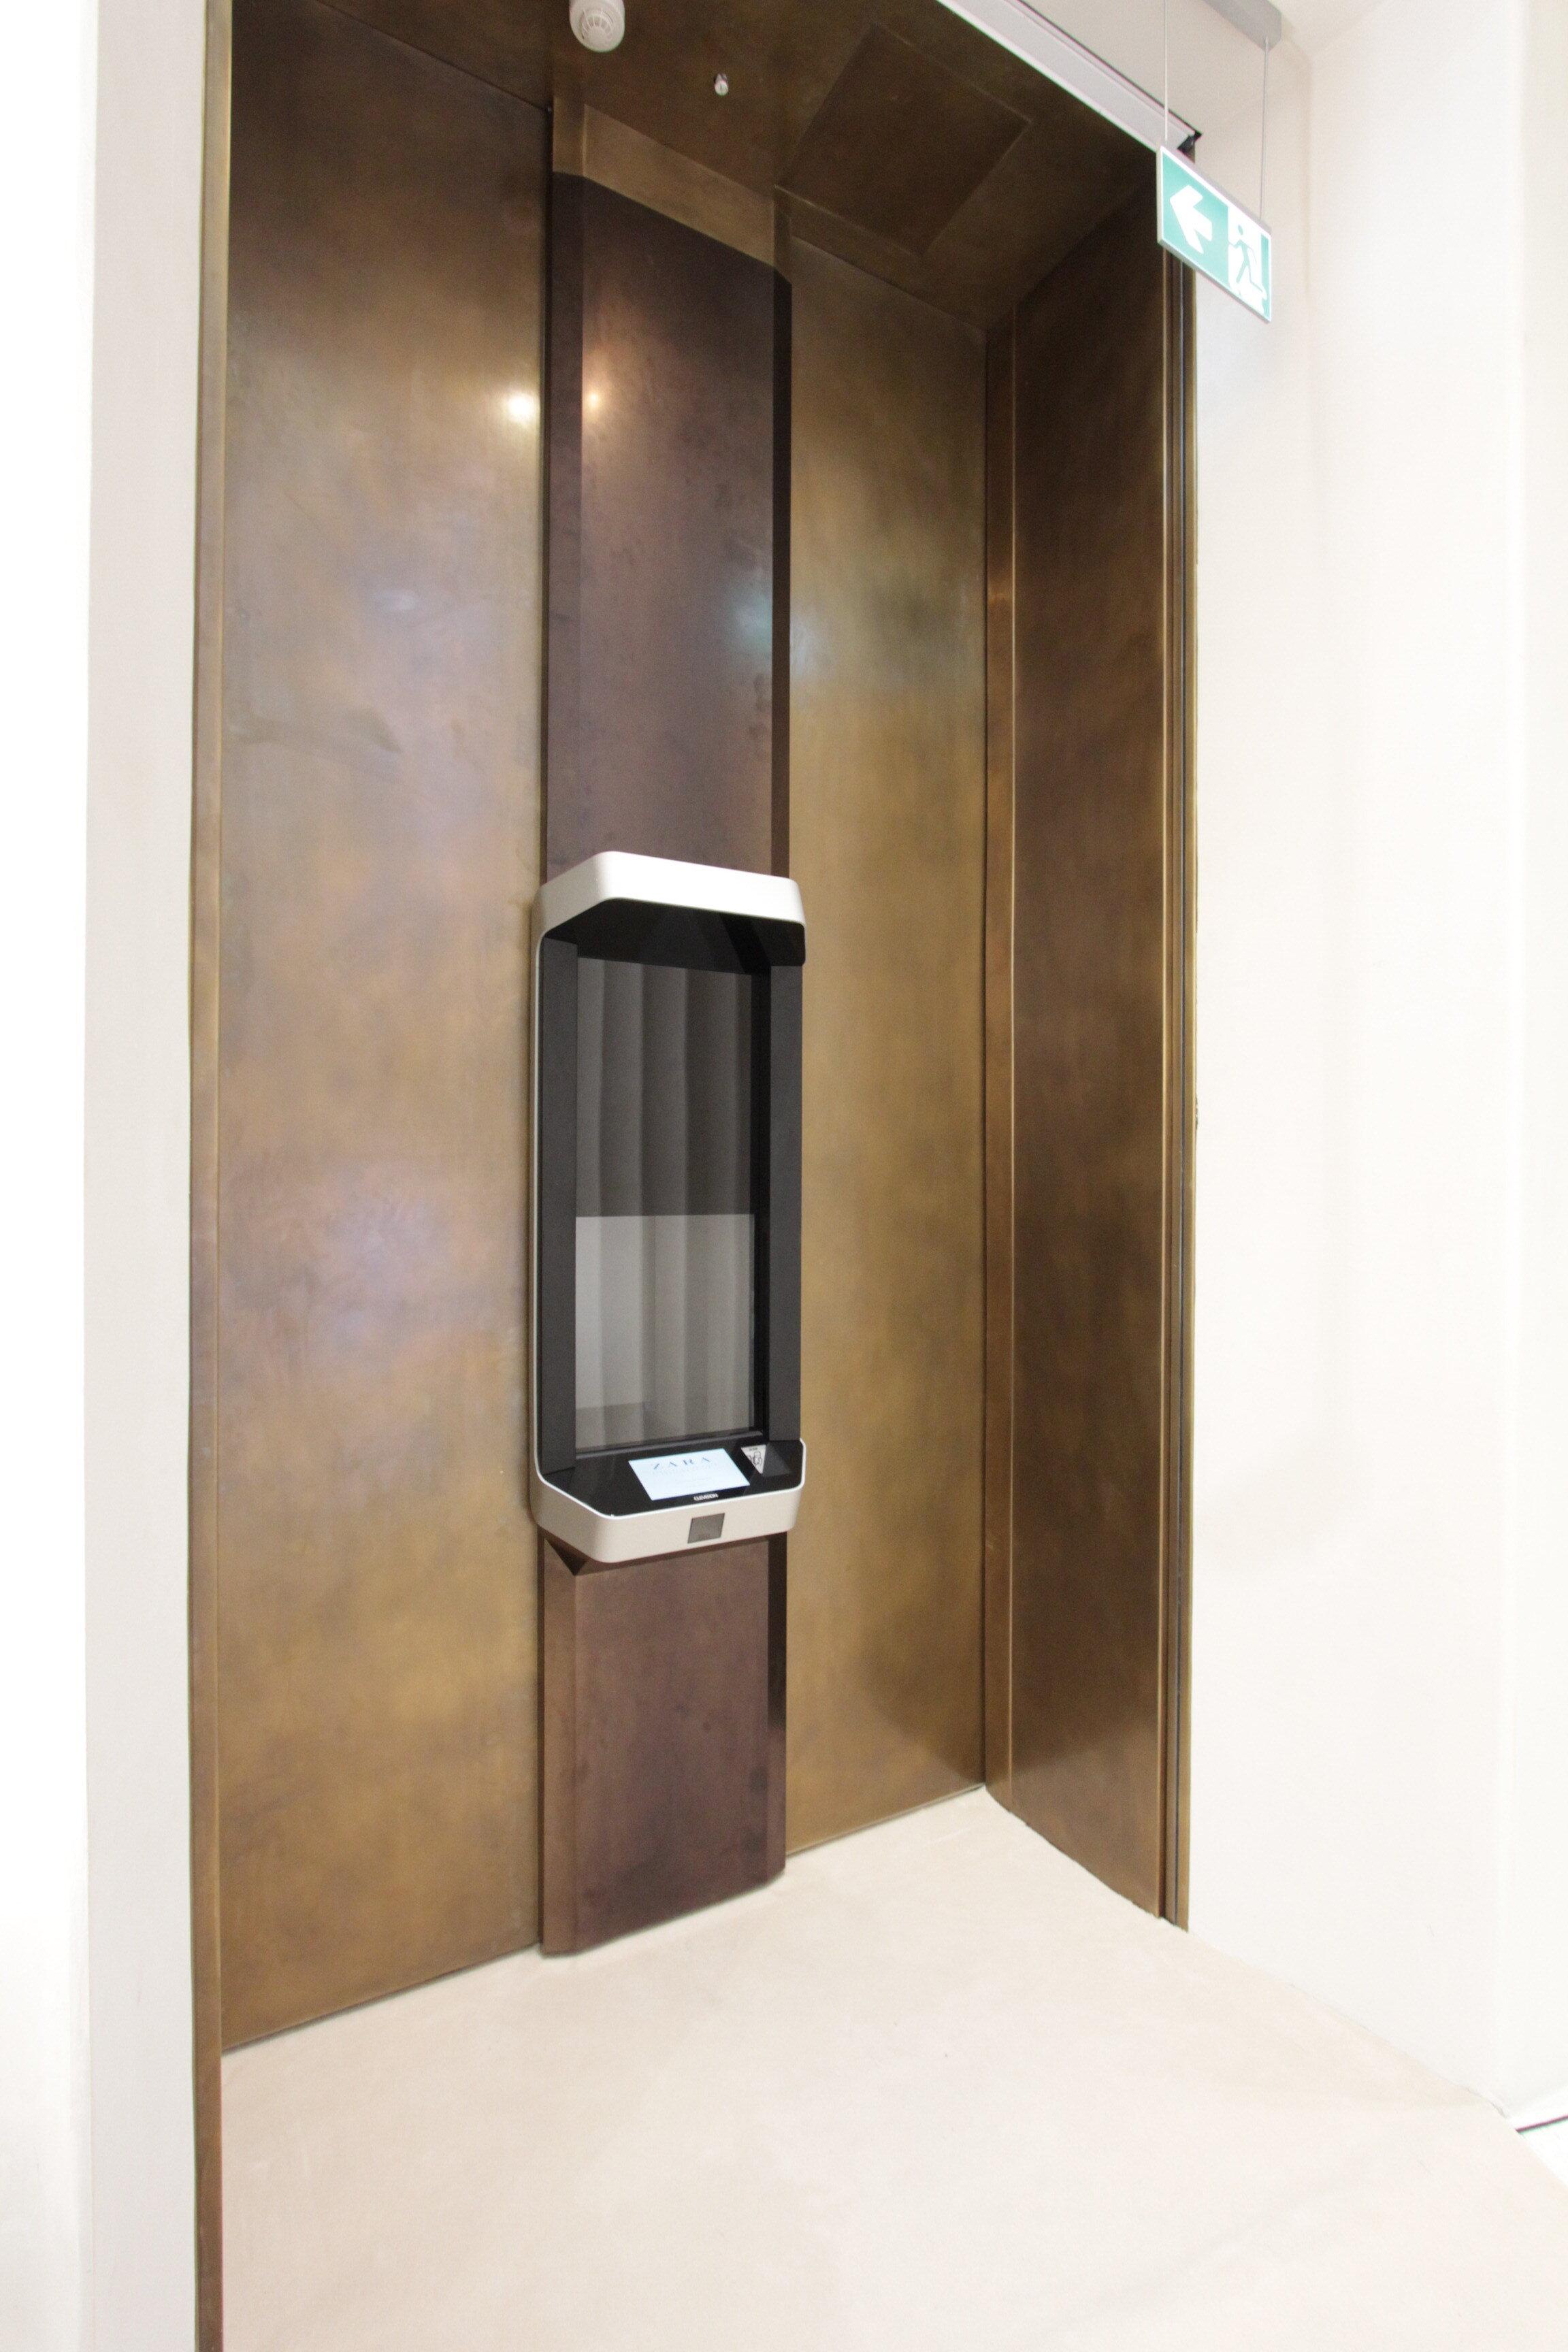 Cleveron 402 Zara Milan_1.JPG